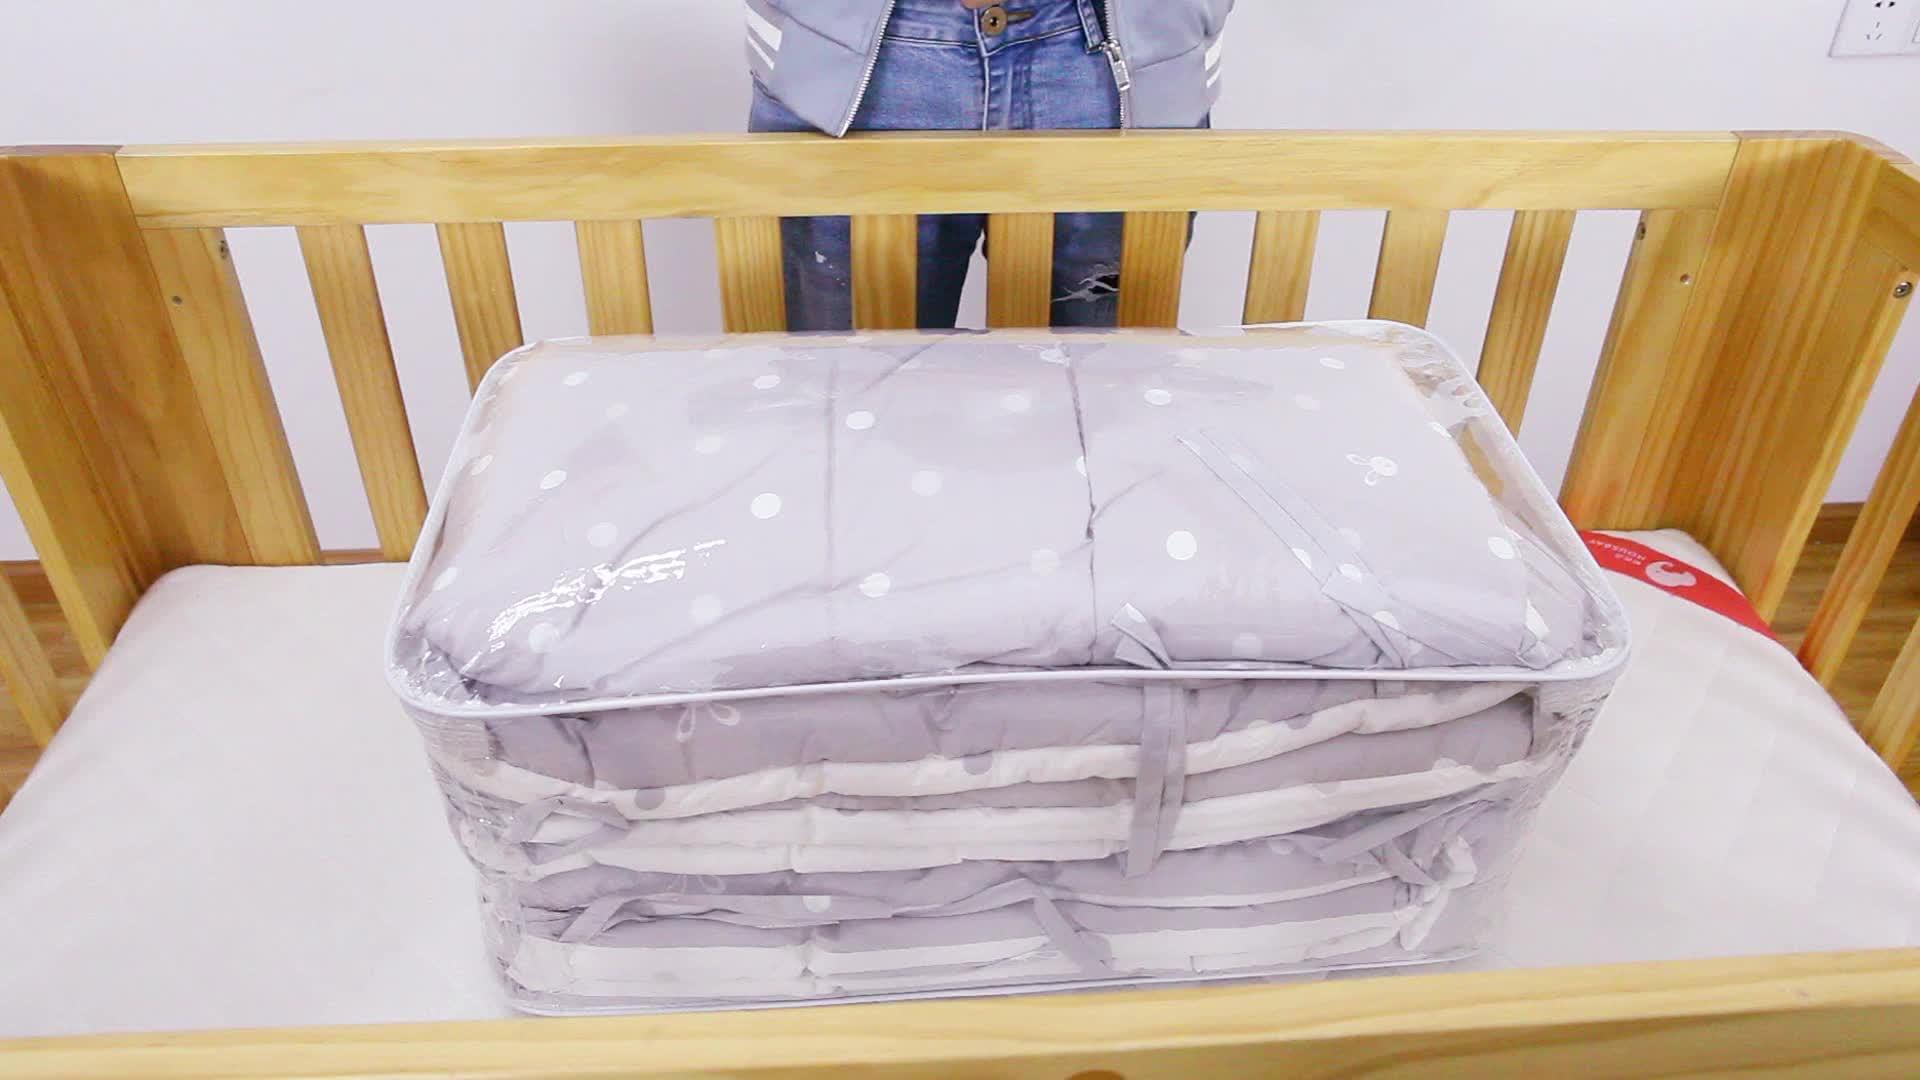 Housbay Reaktif Dicetak 100% Cotton 4 Pcs Bayi Set Tempat Tidur Kartun Tempat Tidur Bayi Set Tempat Tidur dengan Crib Bumper untuk Spring Full dan Musim Dingin